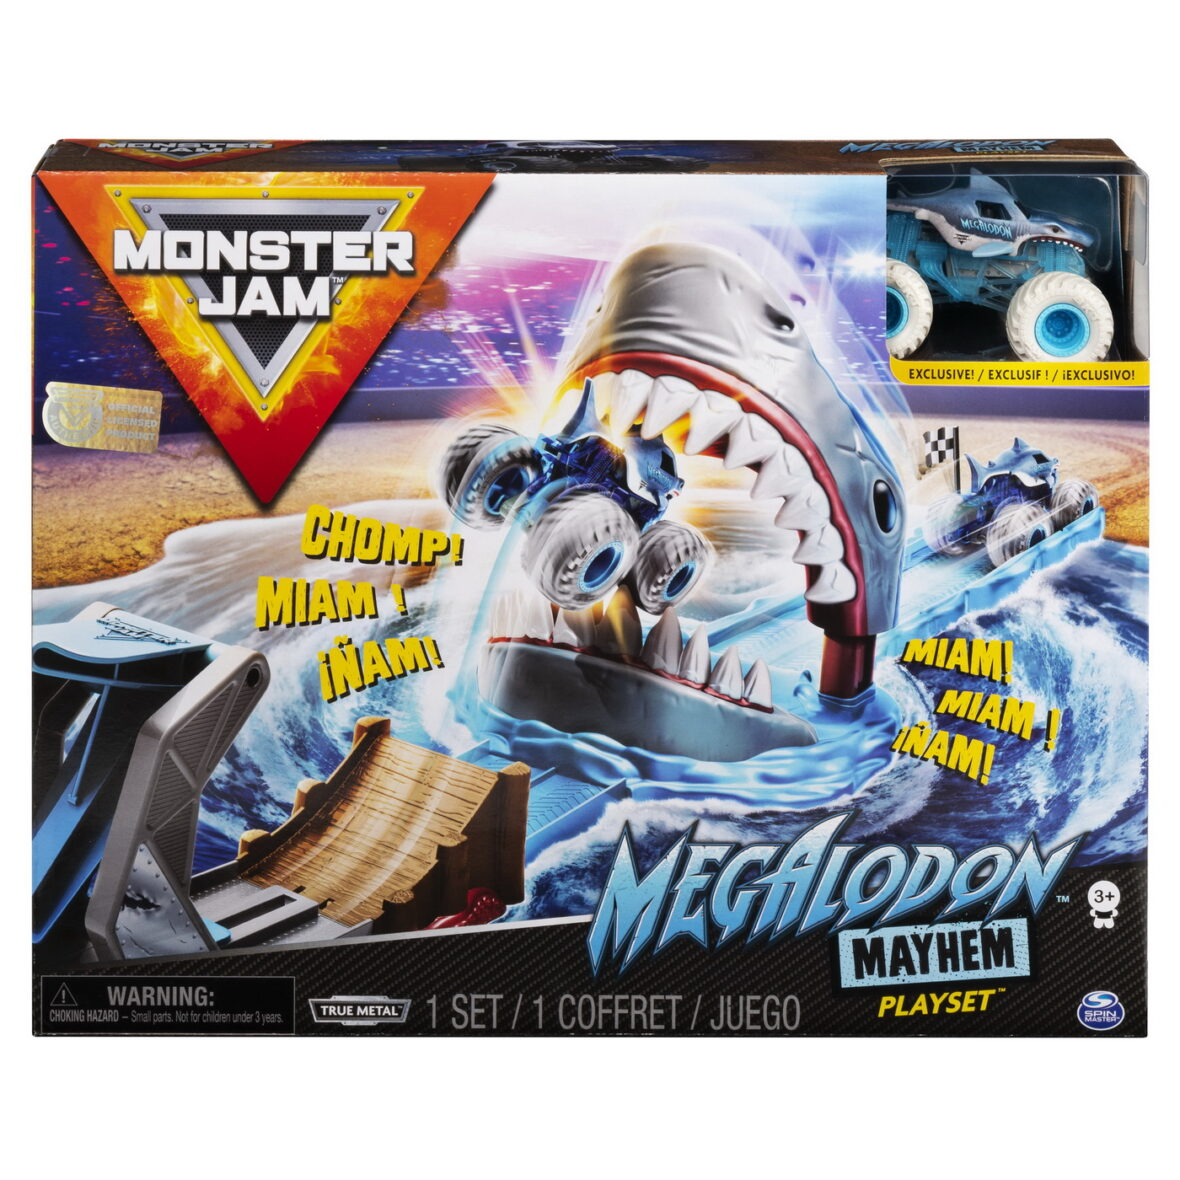 Monster Jam Set Cascadorii Megalodon Mayhem